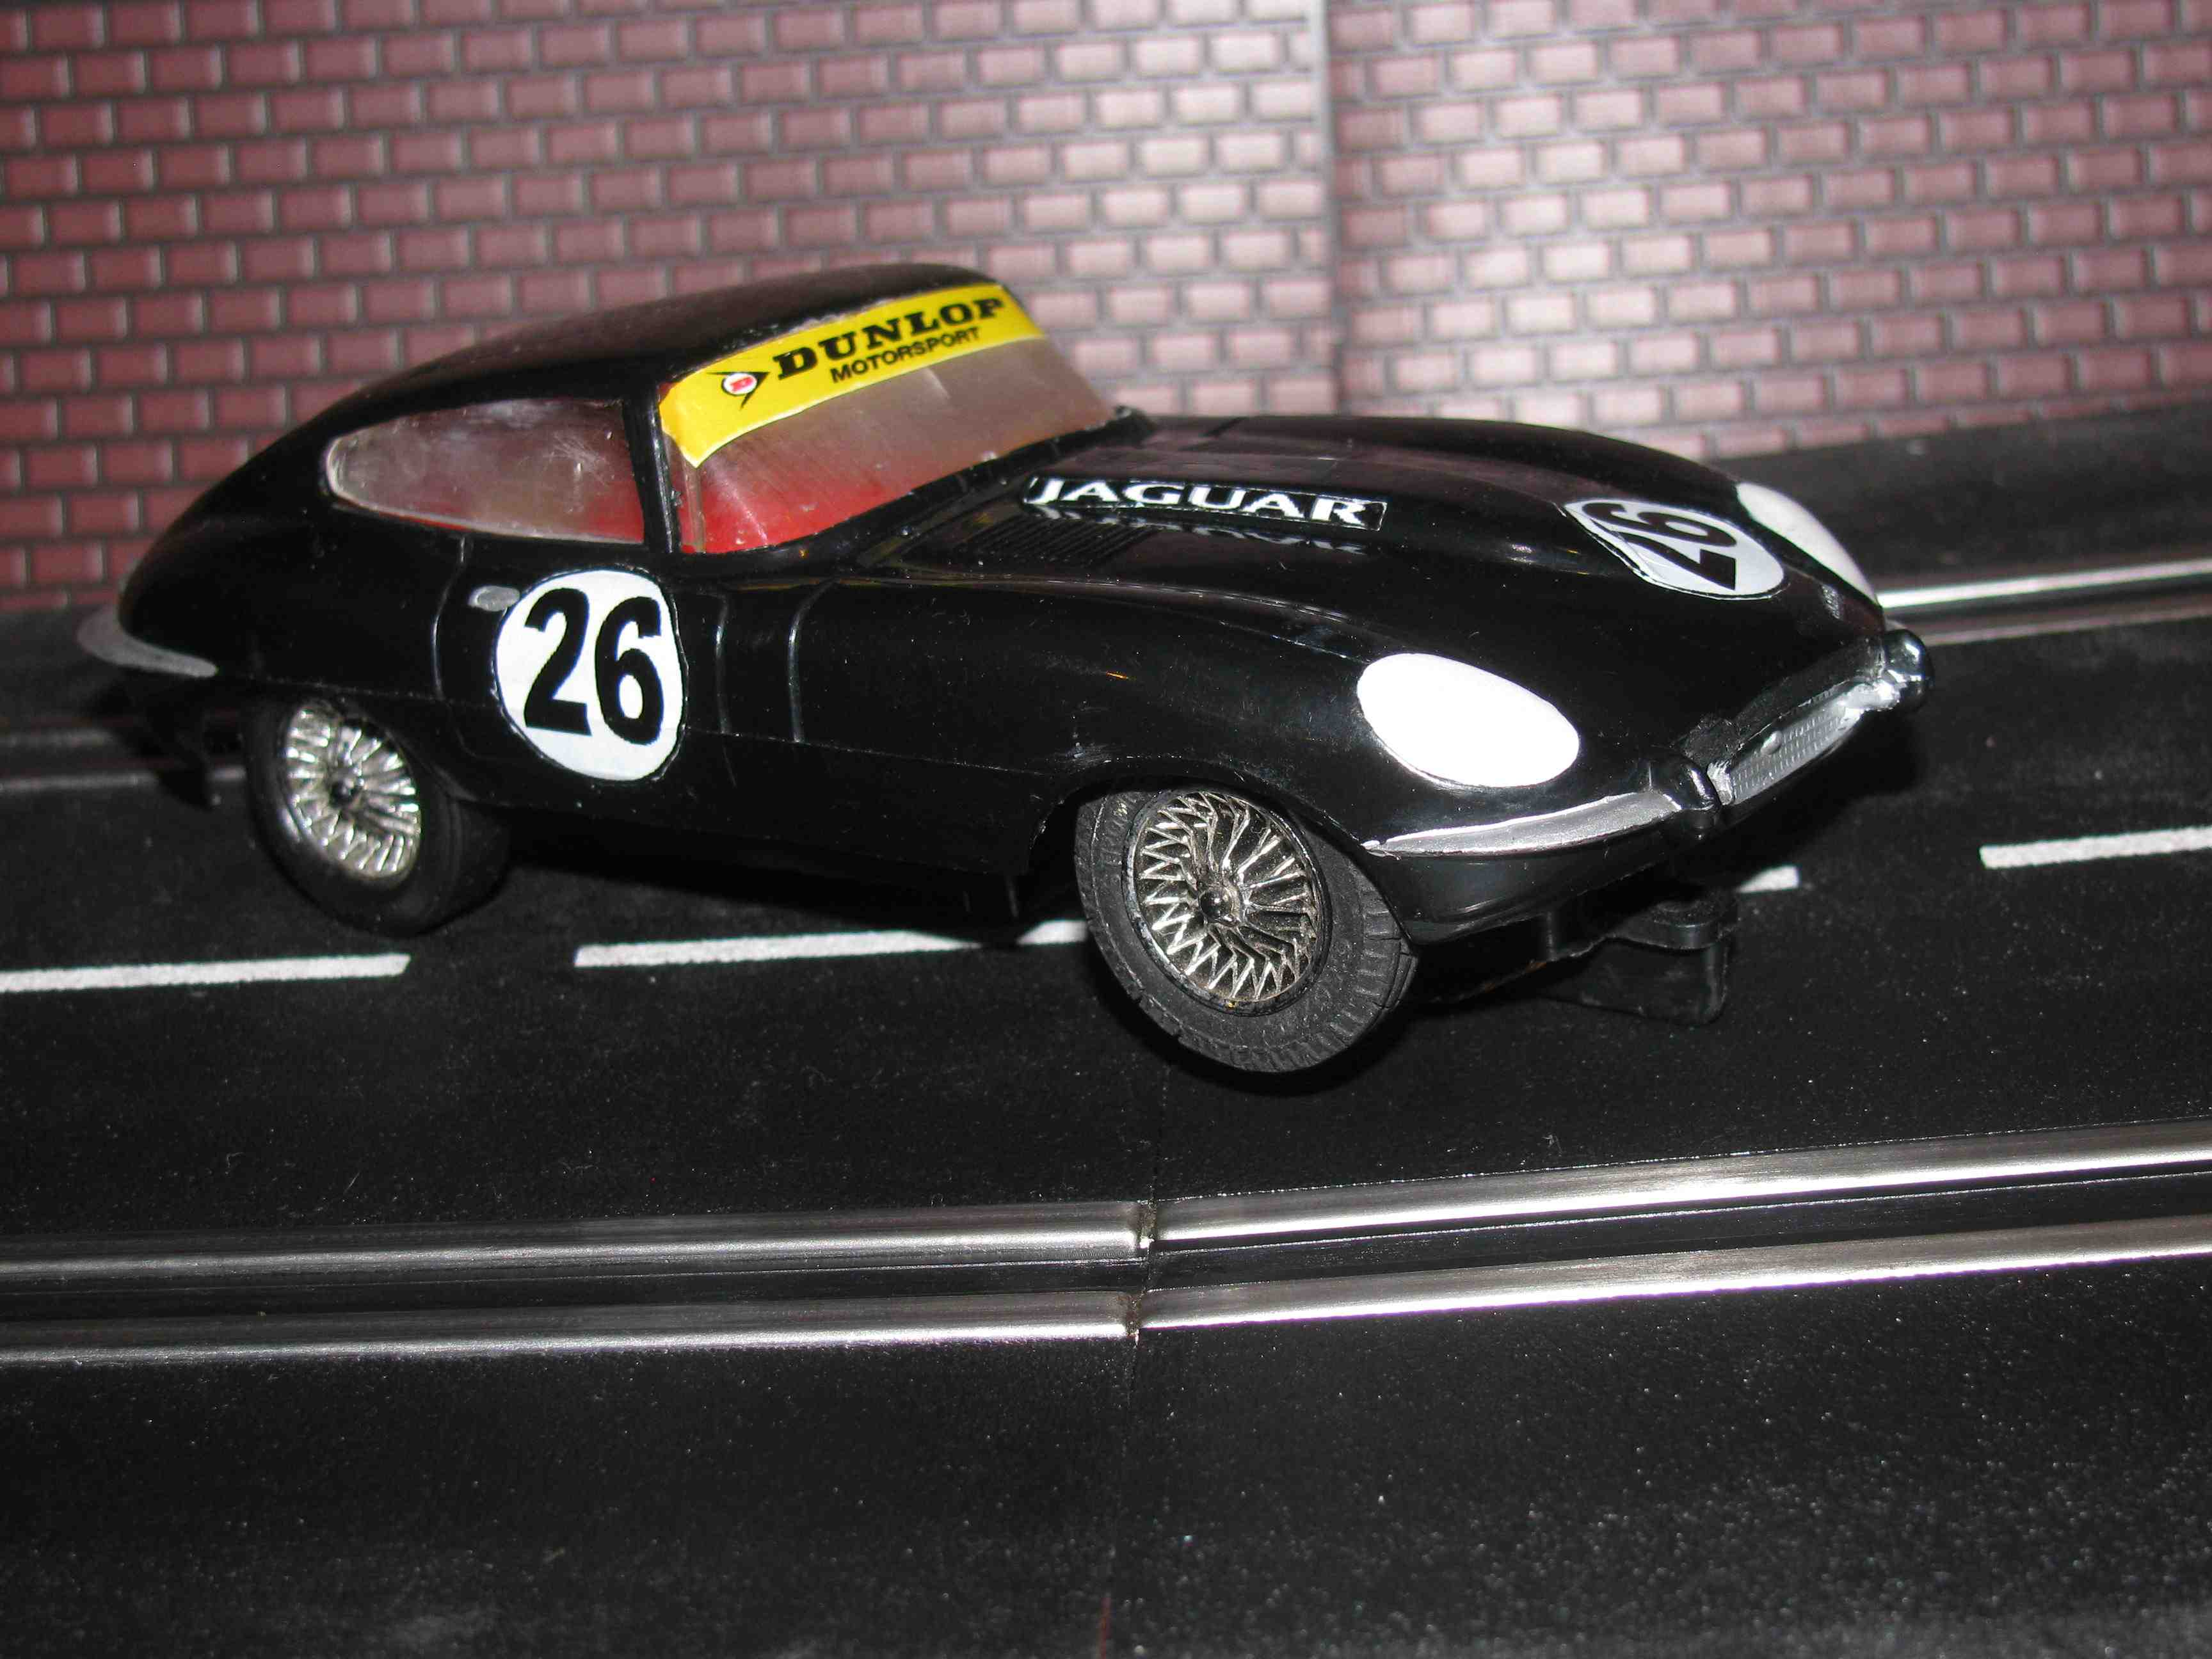 * SOLD * Strombecker Jaguar XKE Slot Car 1/32 Scale – Black – Car #26